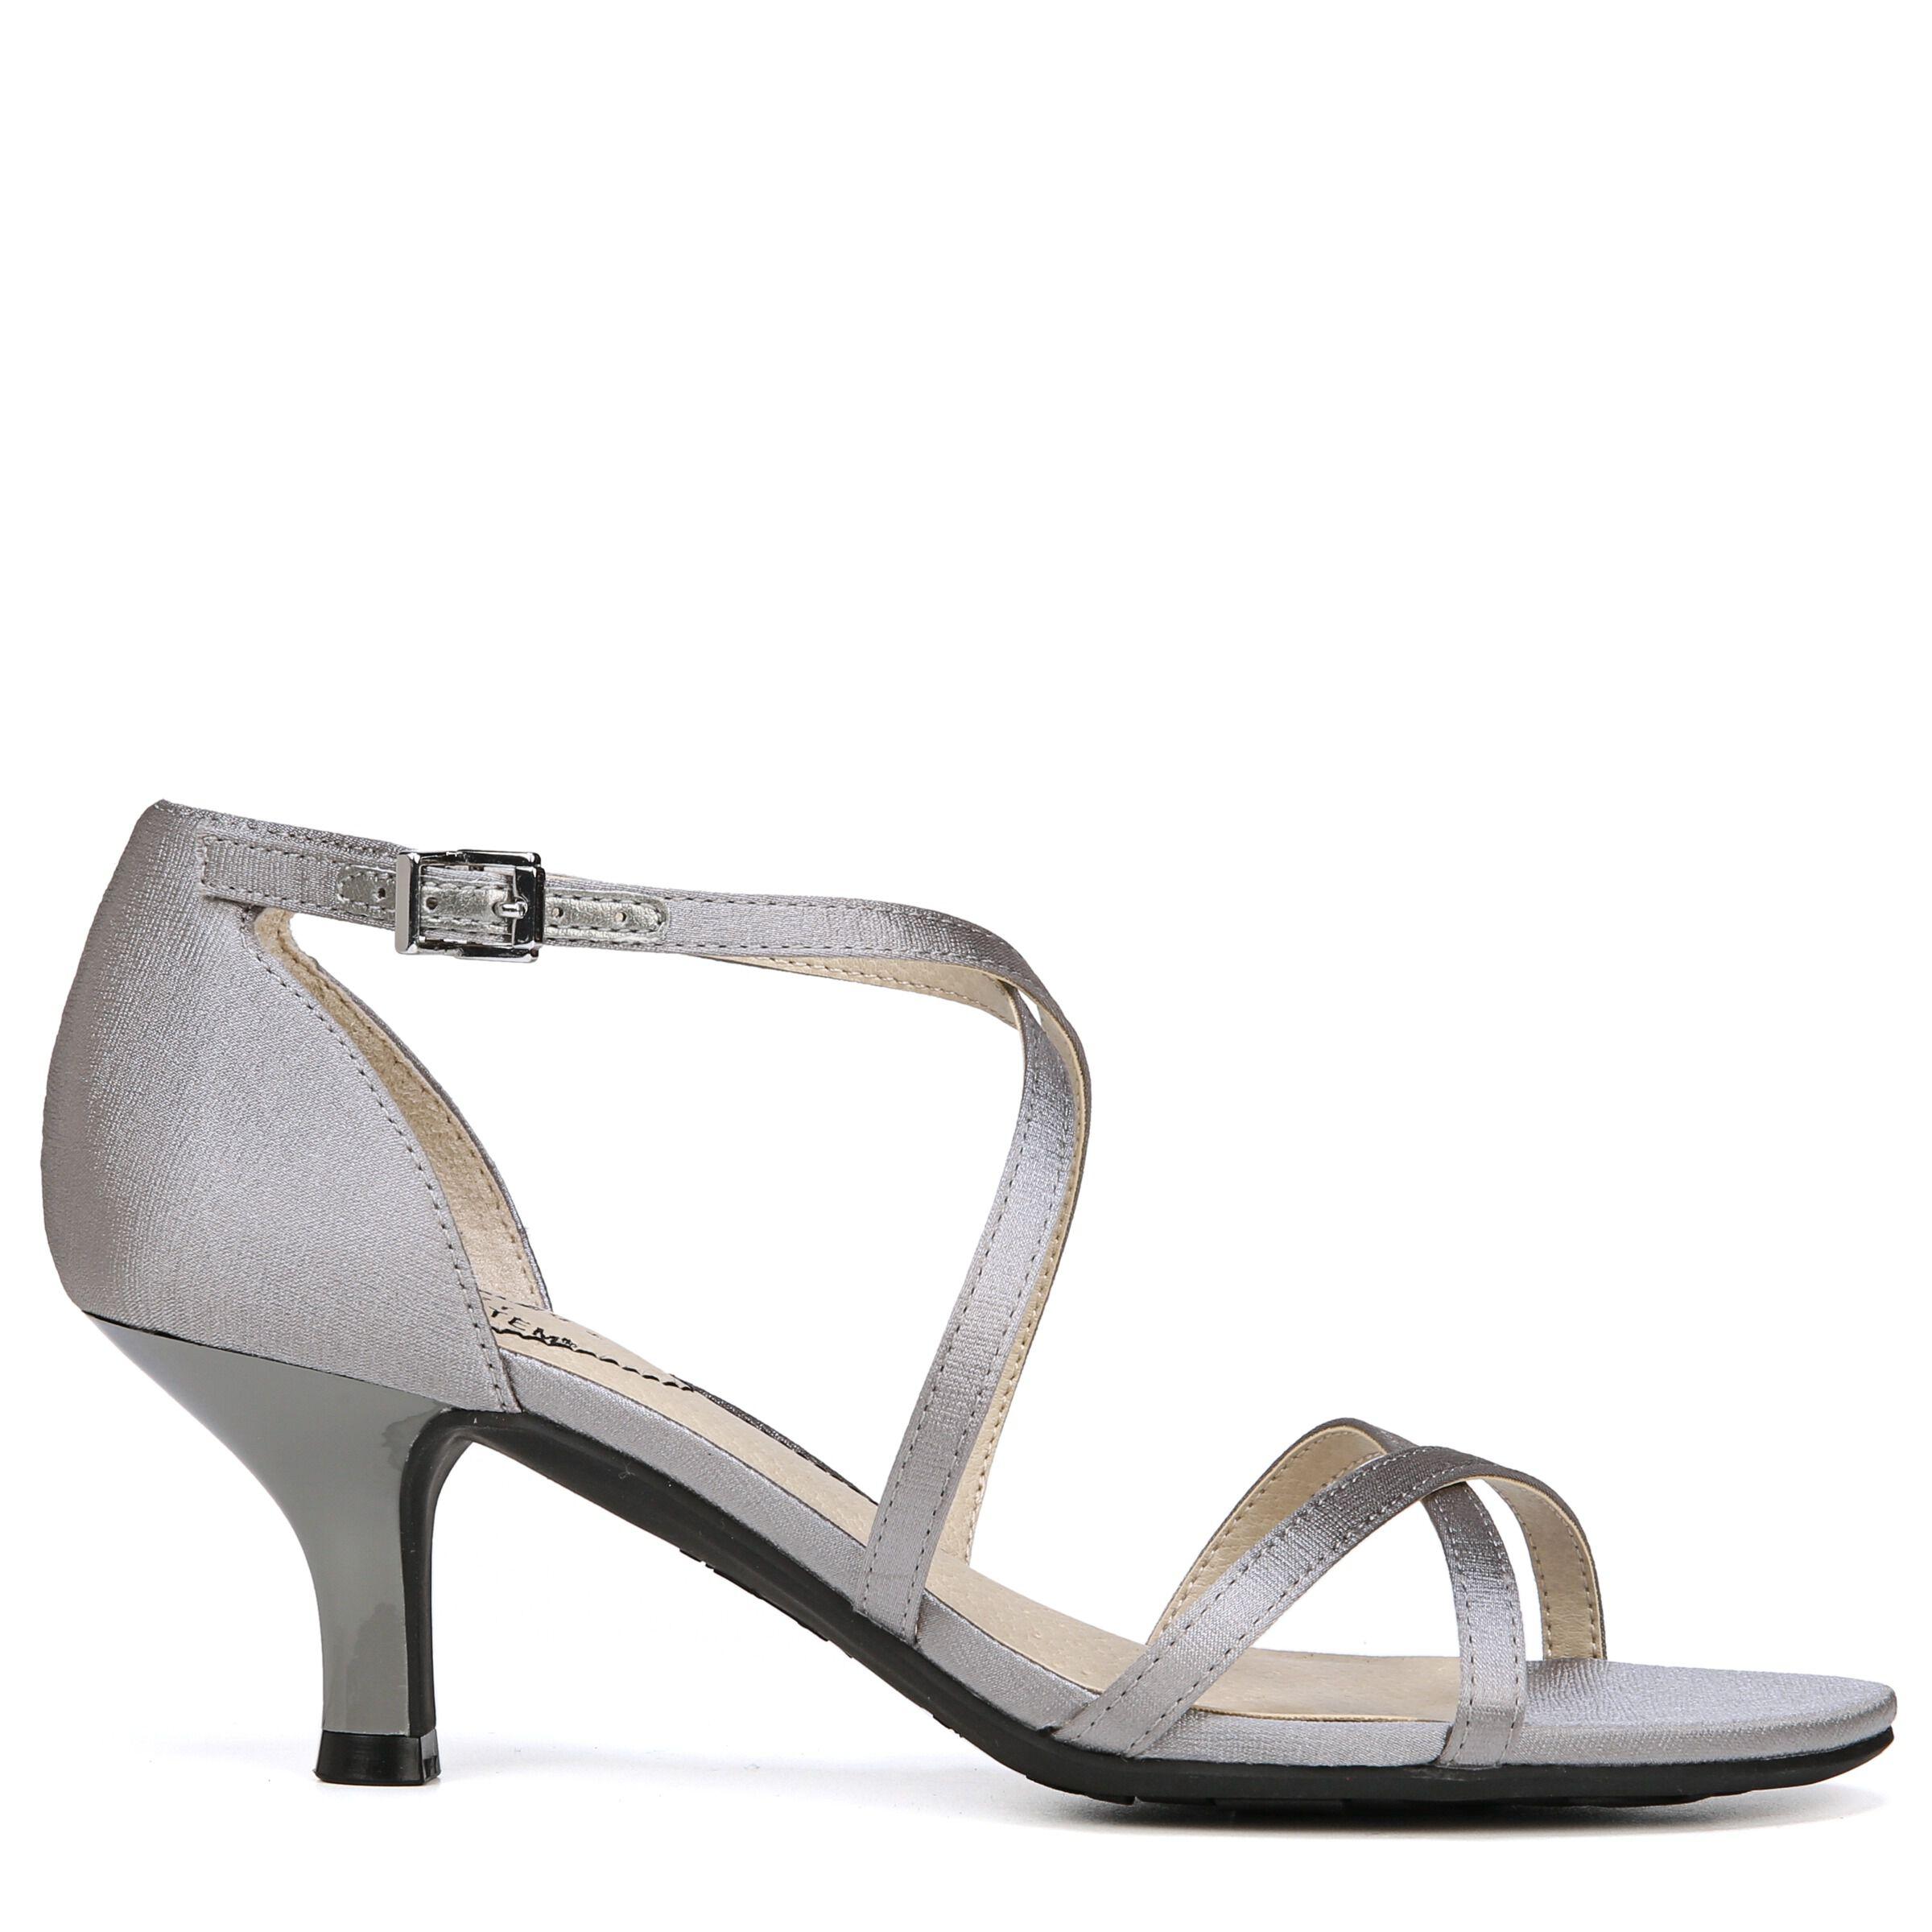 Women's LifeStride Flaunt Strappy Heeled Dress Sandals Pewter T. Satin